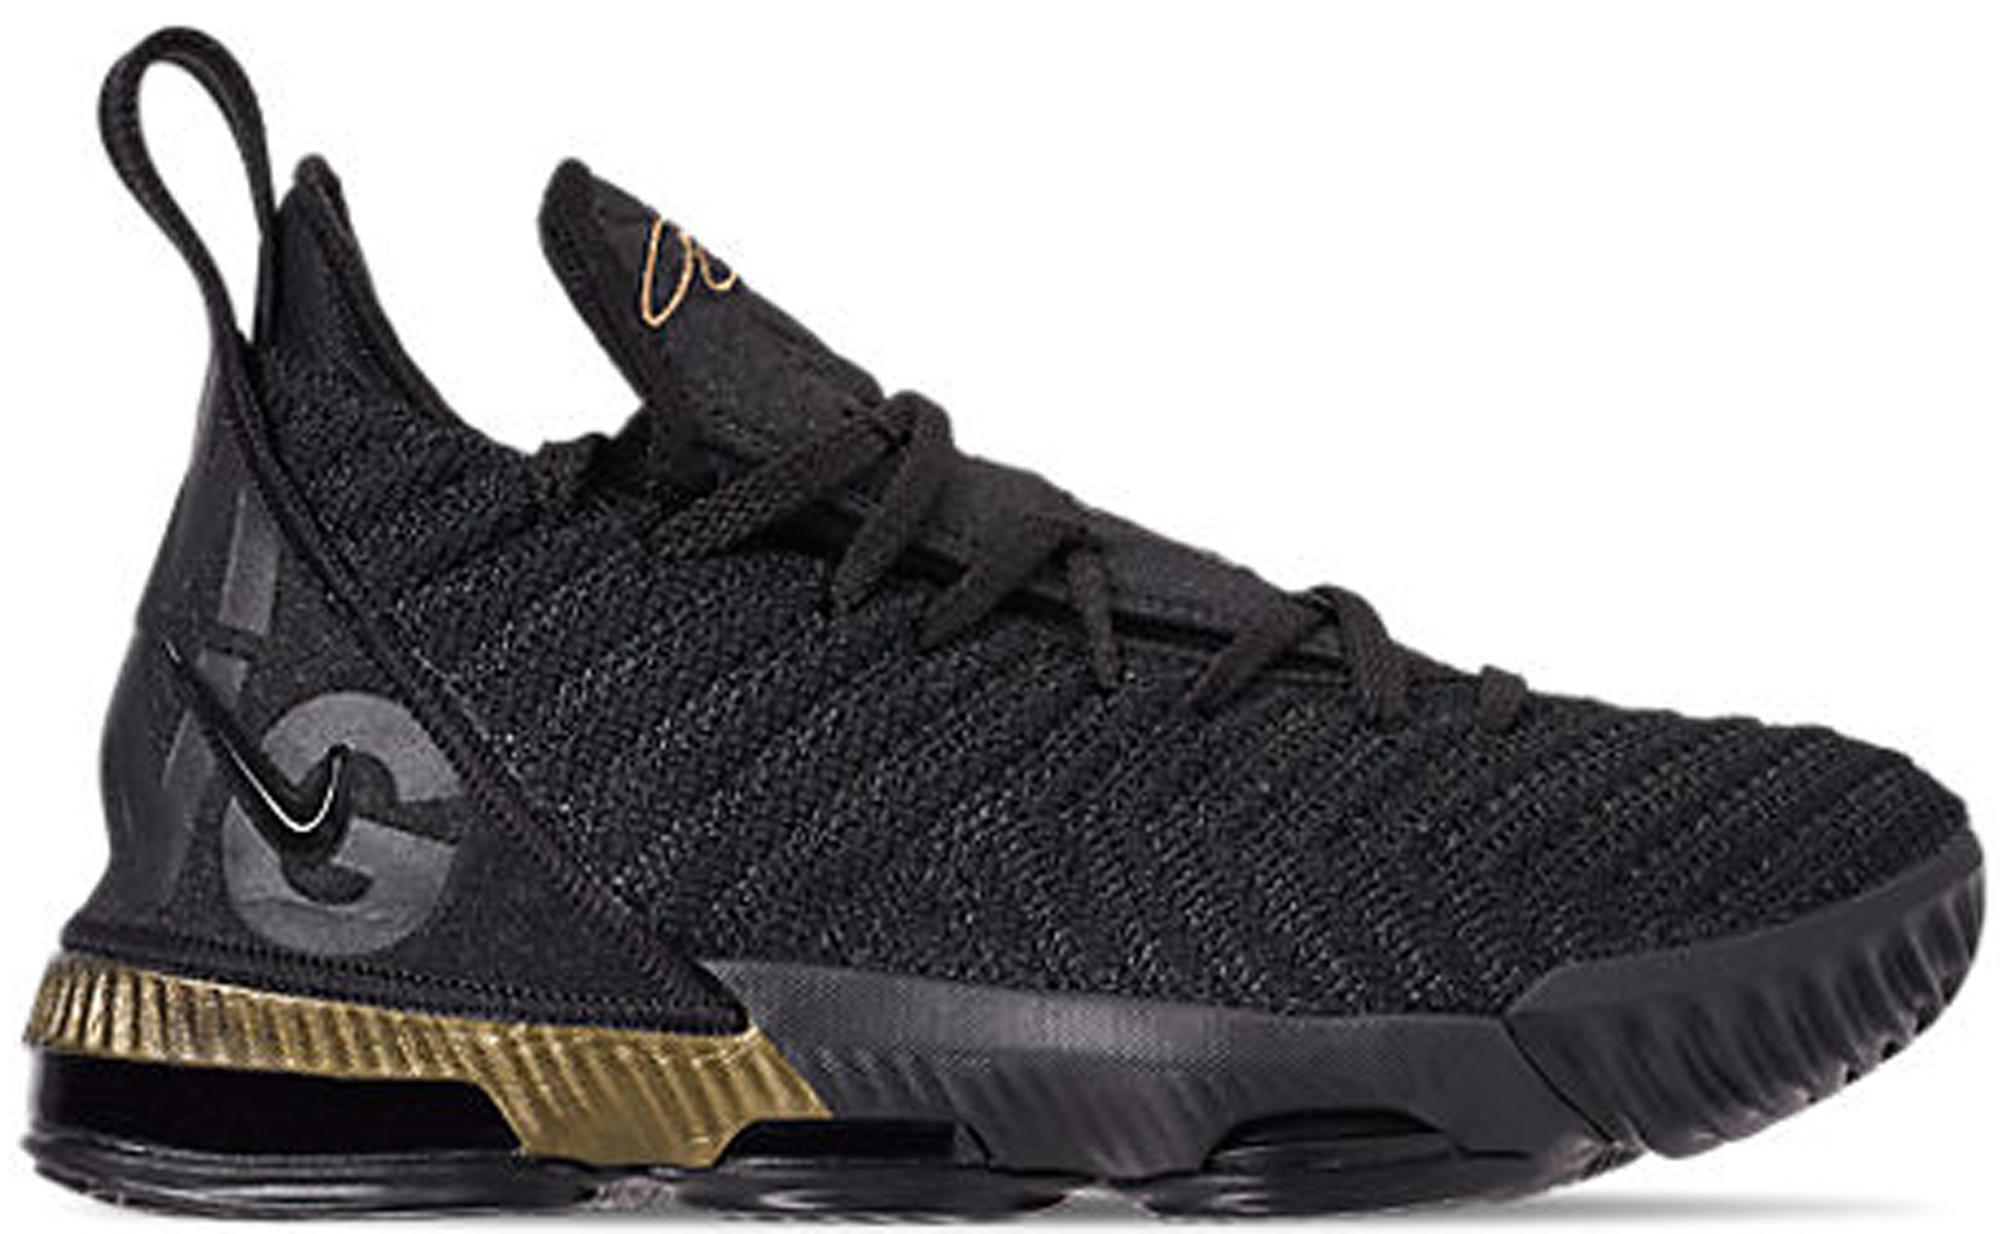 Nike LeBron 16 I'm King (GS) - AQ2465-007